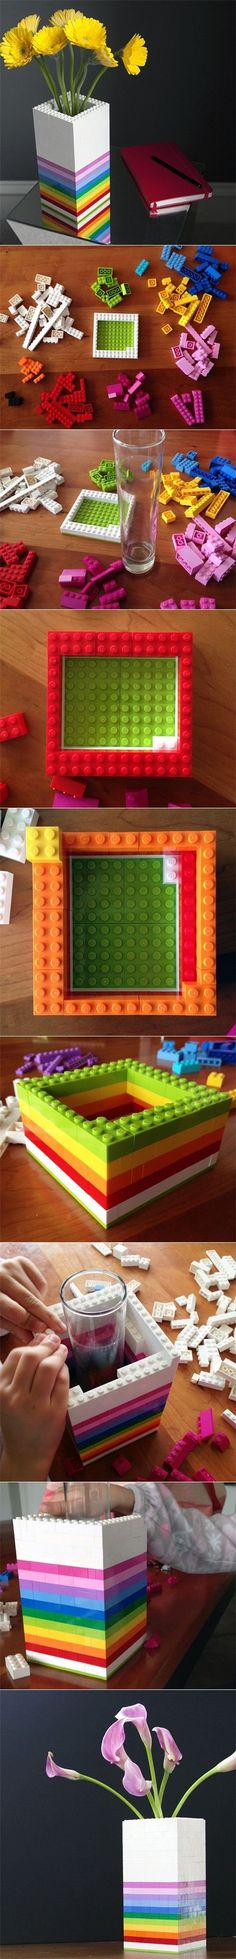 LEGO Flower Vase